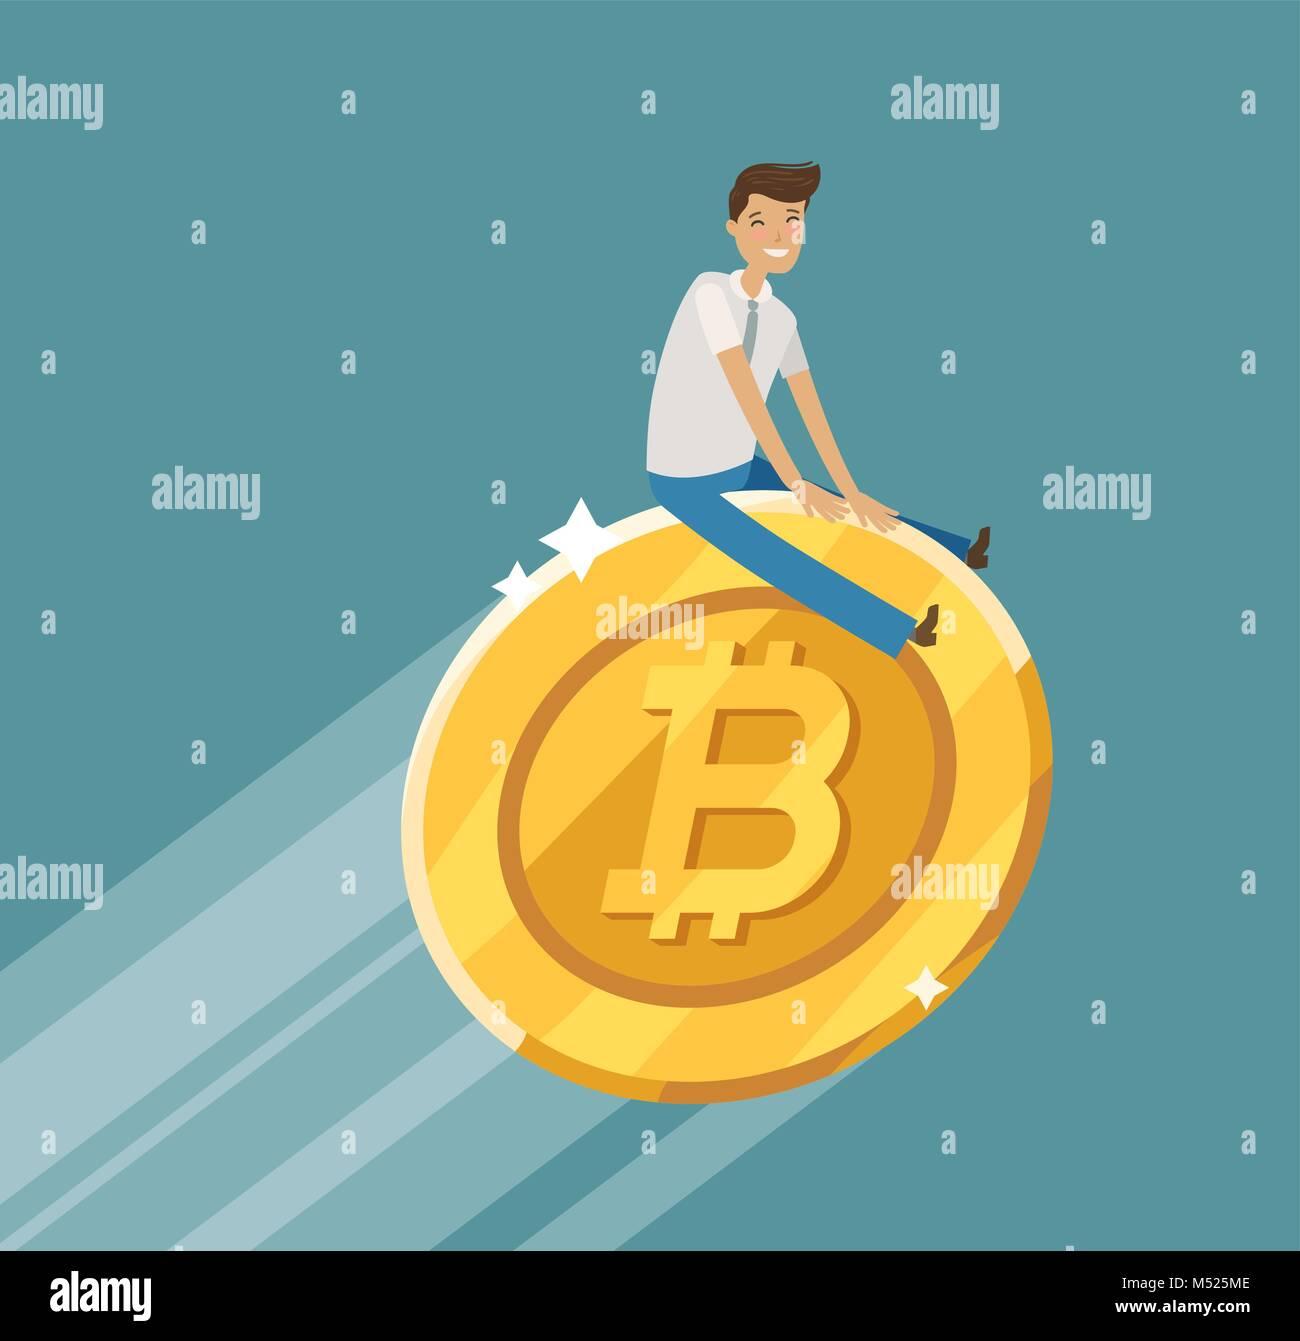 Geschäftskonzept. Bitcoin crypto Währung blockchain. Cartoon Vector Illustration Stockbild